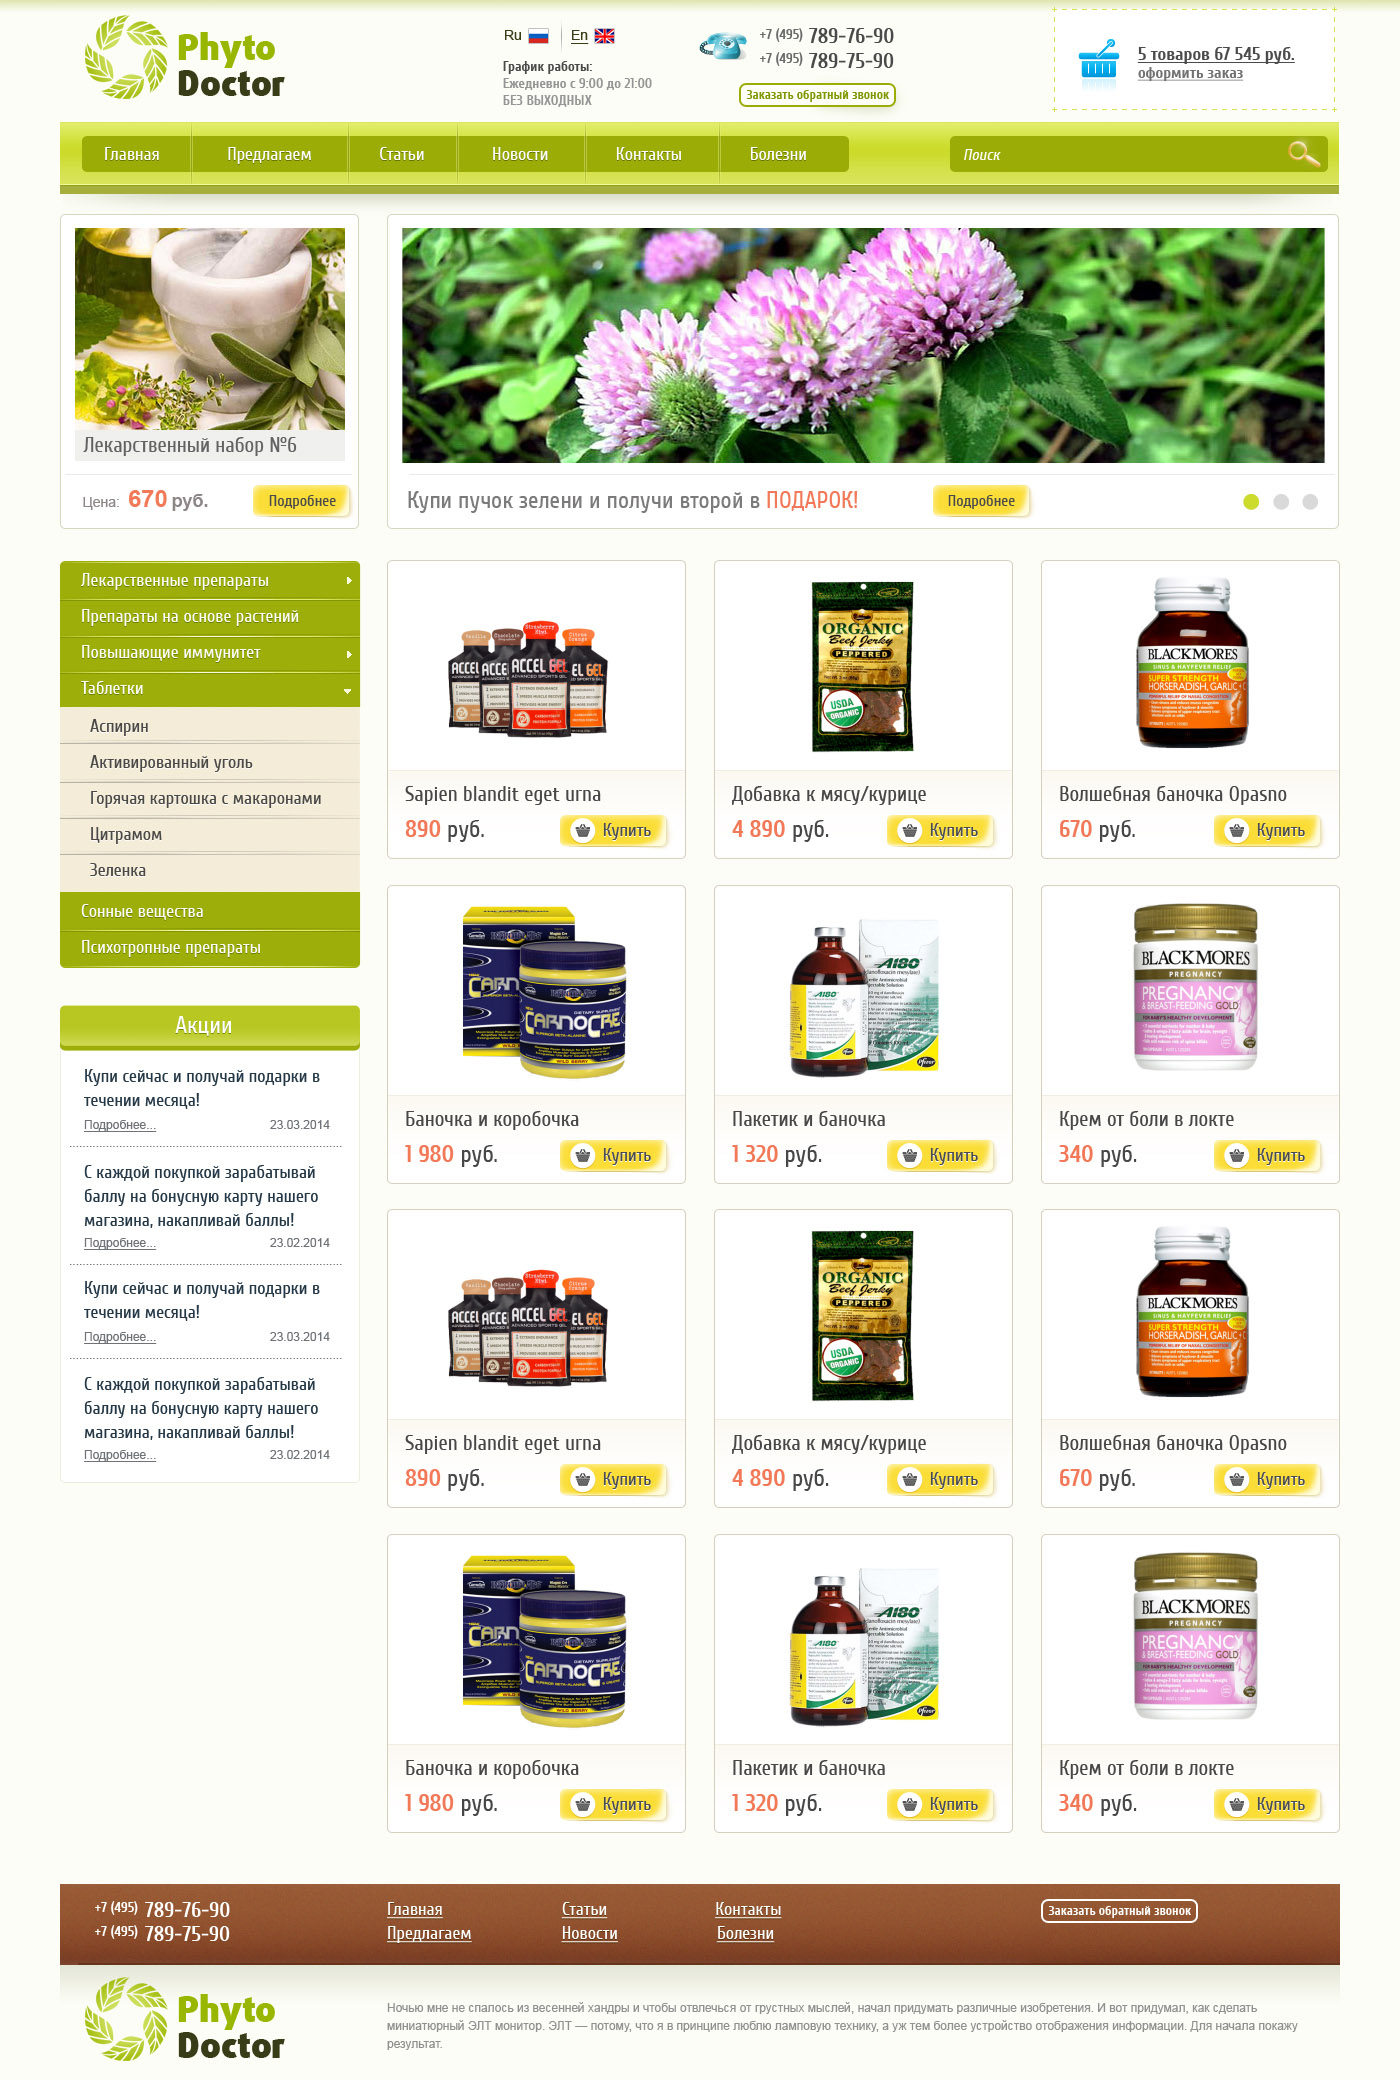 Дизайн интернет магазина Phyto Doctor